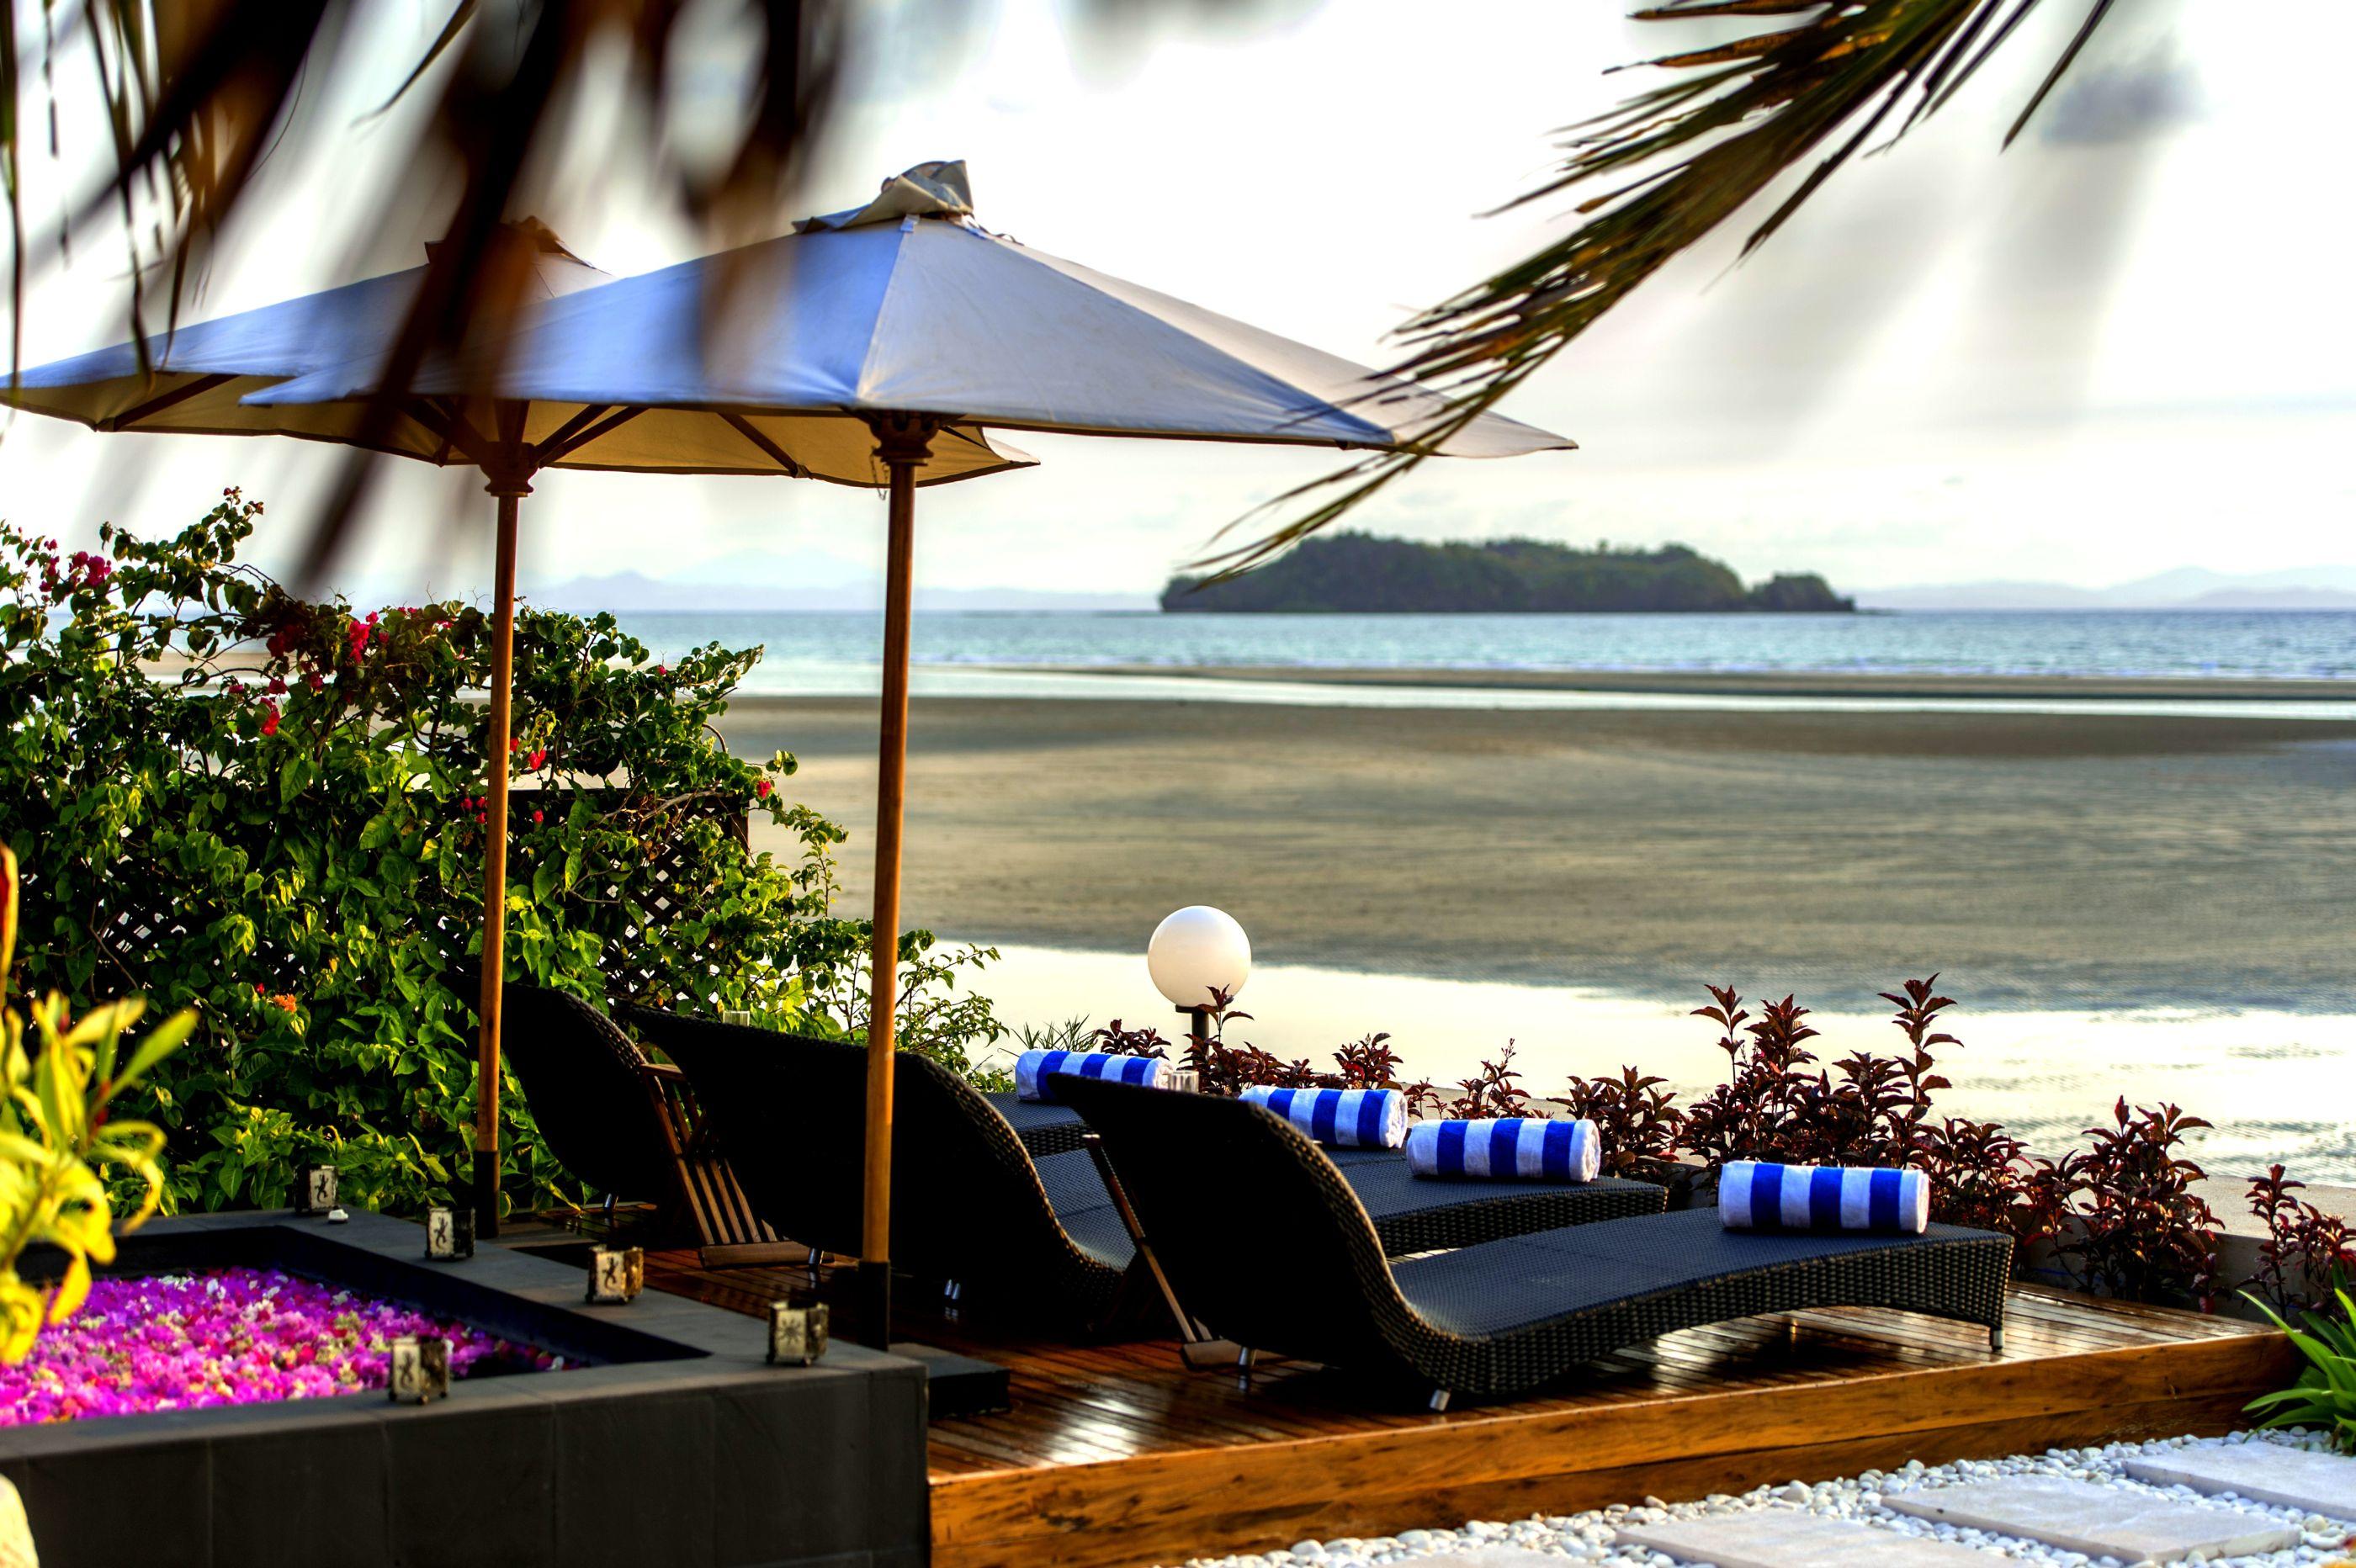 Honeymoon-Madagascar holidays